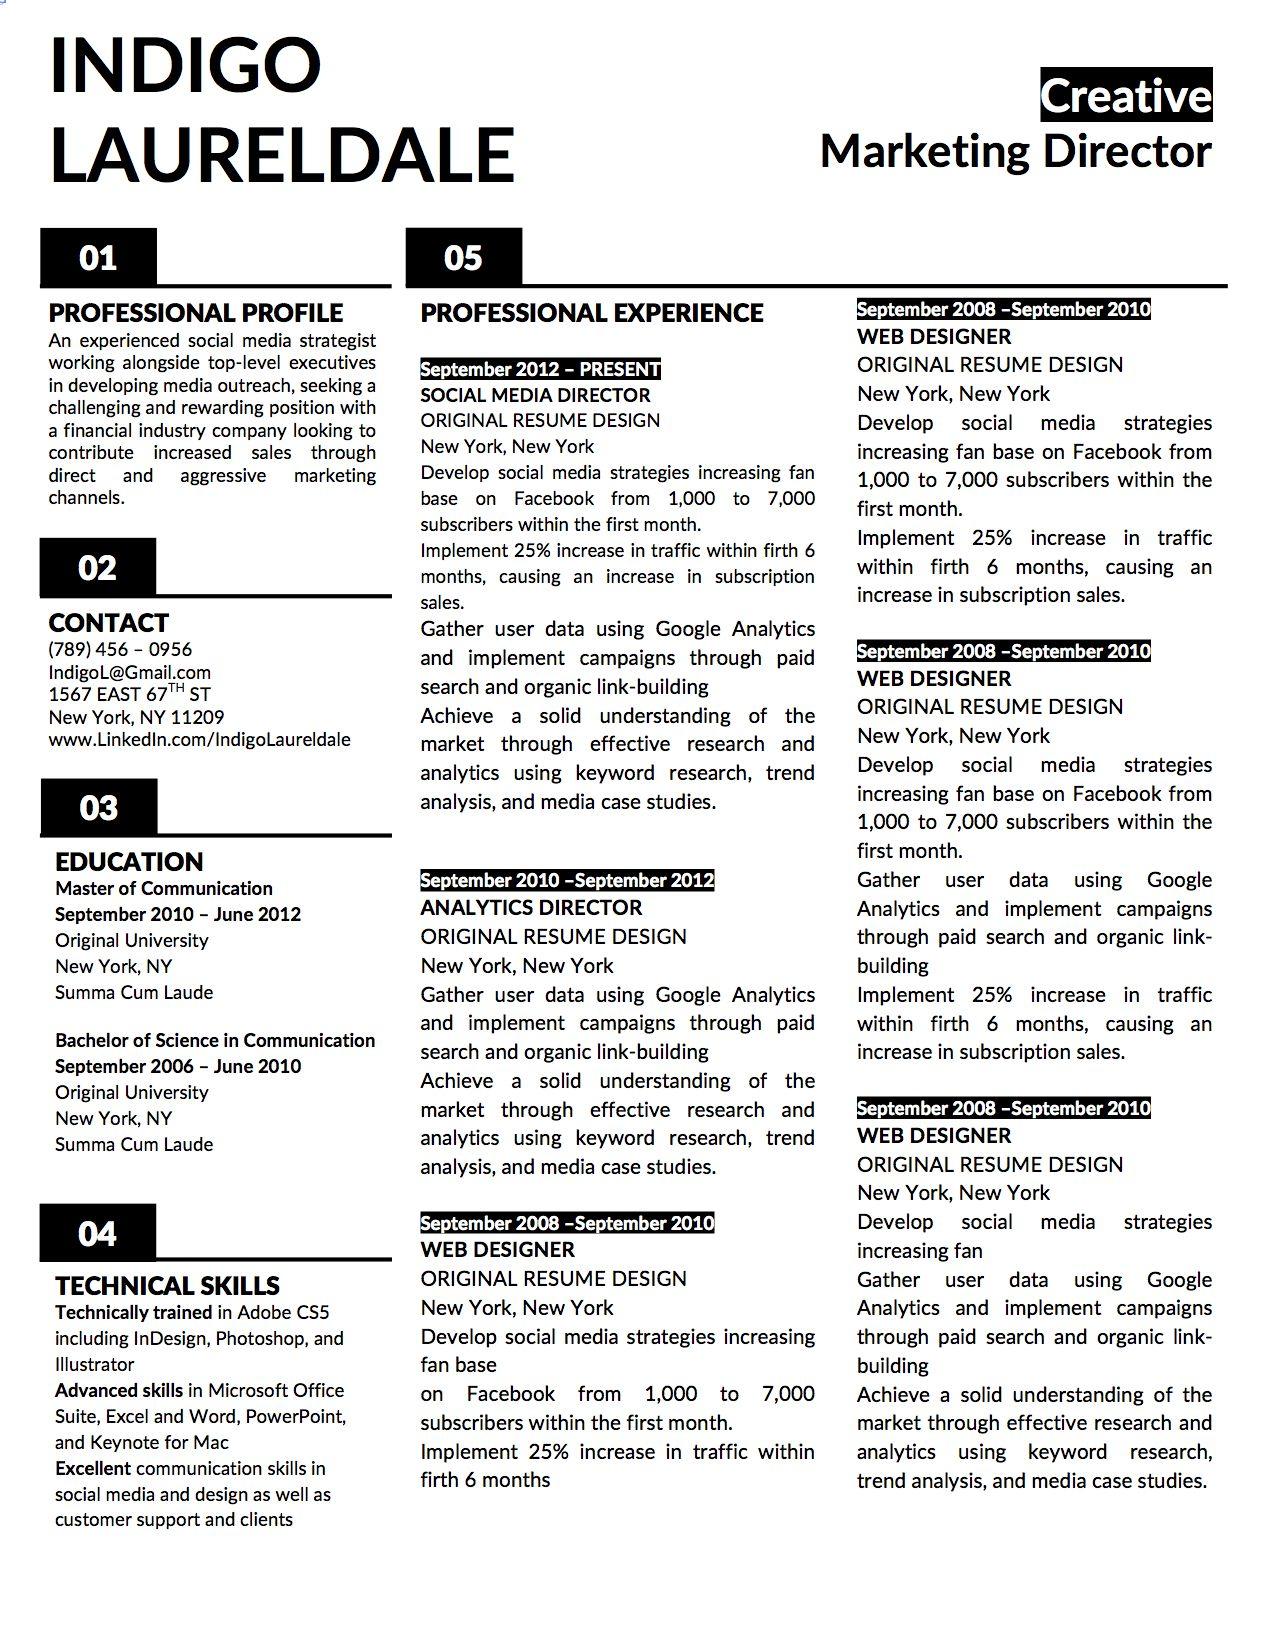 Indigo Lauderdale Resume Template for Microsoft Word   Indigo ...